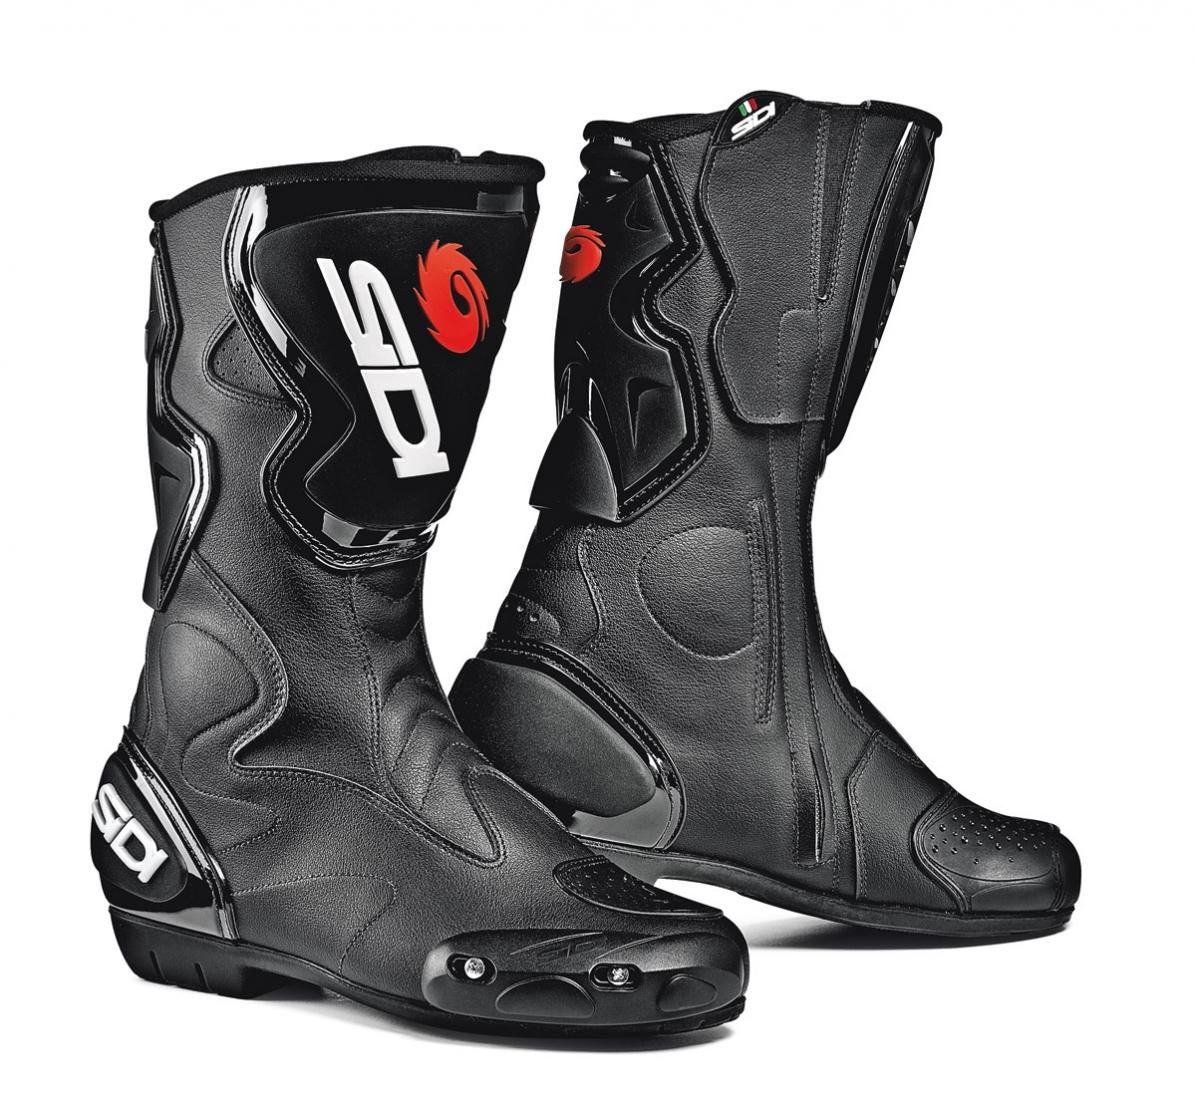 25292eee875 motocyklové boty SIDI FUSION black